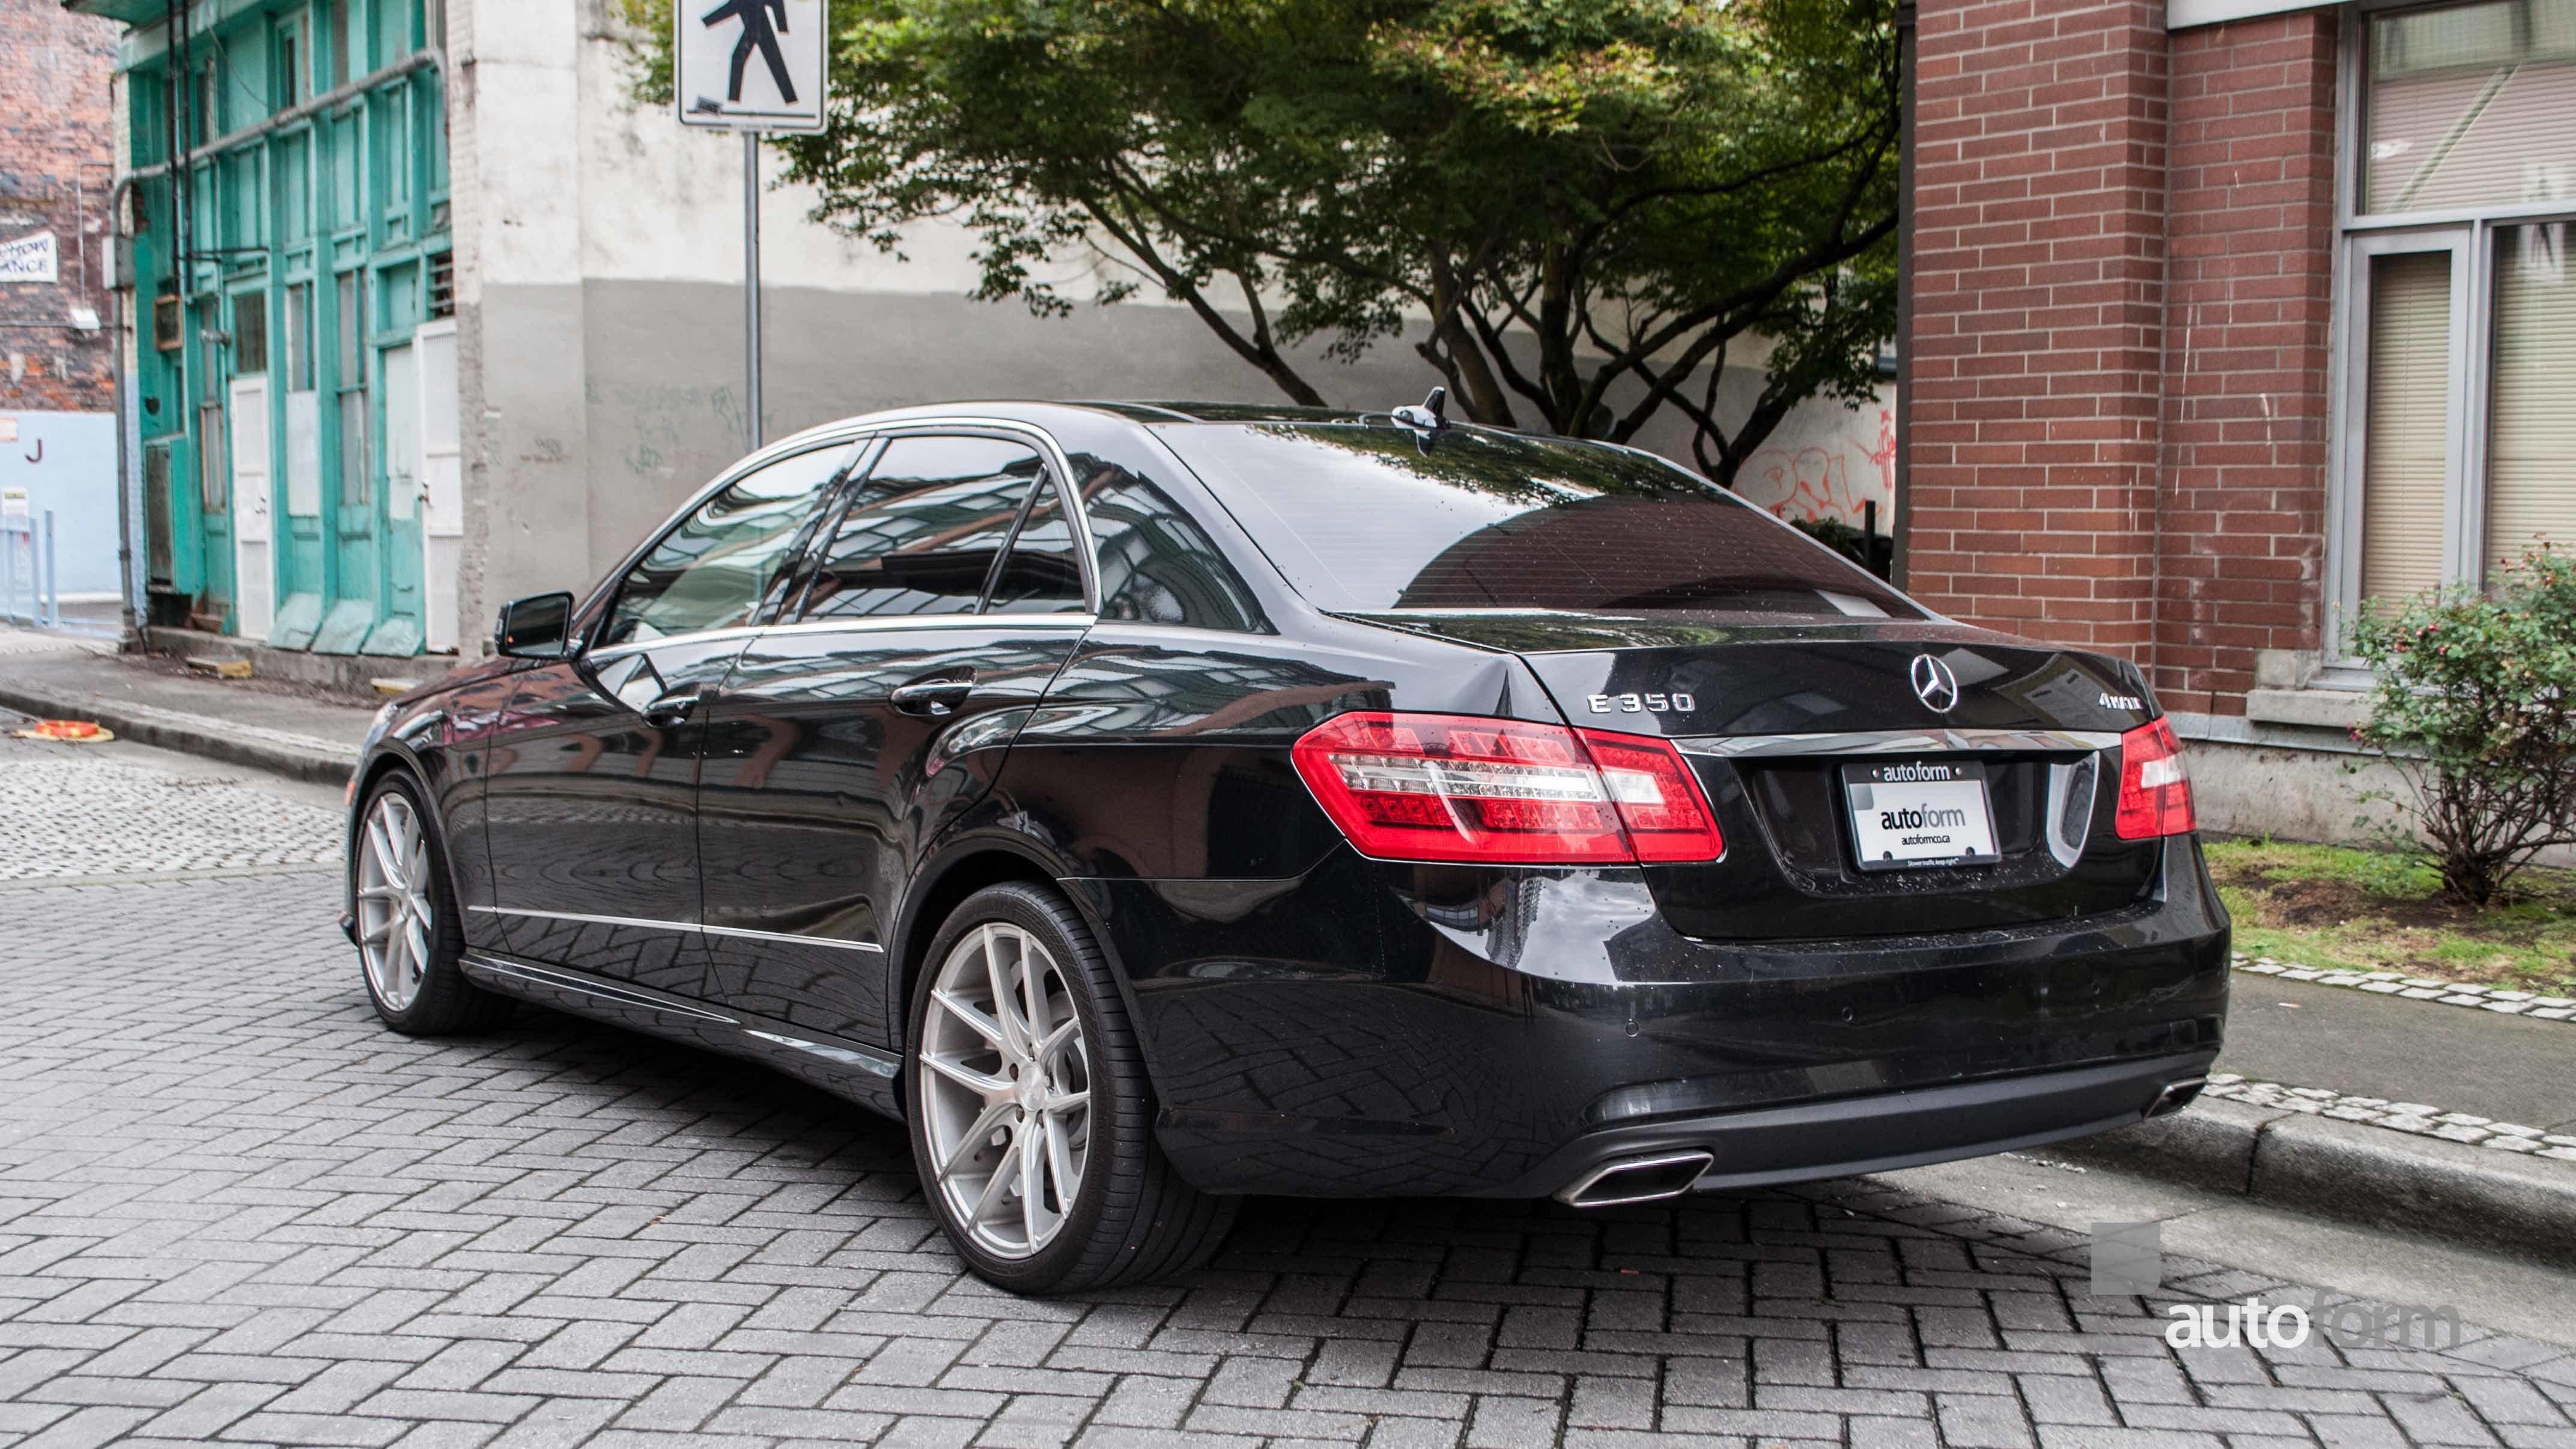 2011 Mercedes-Benz E350 Luxury 4MATIC   Autoform